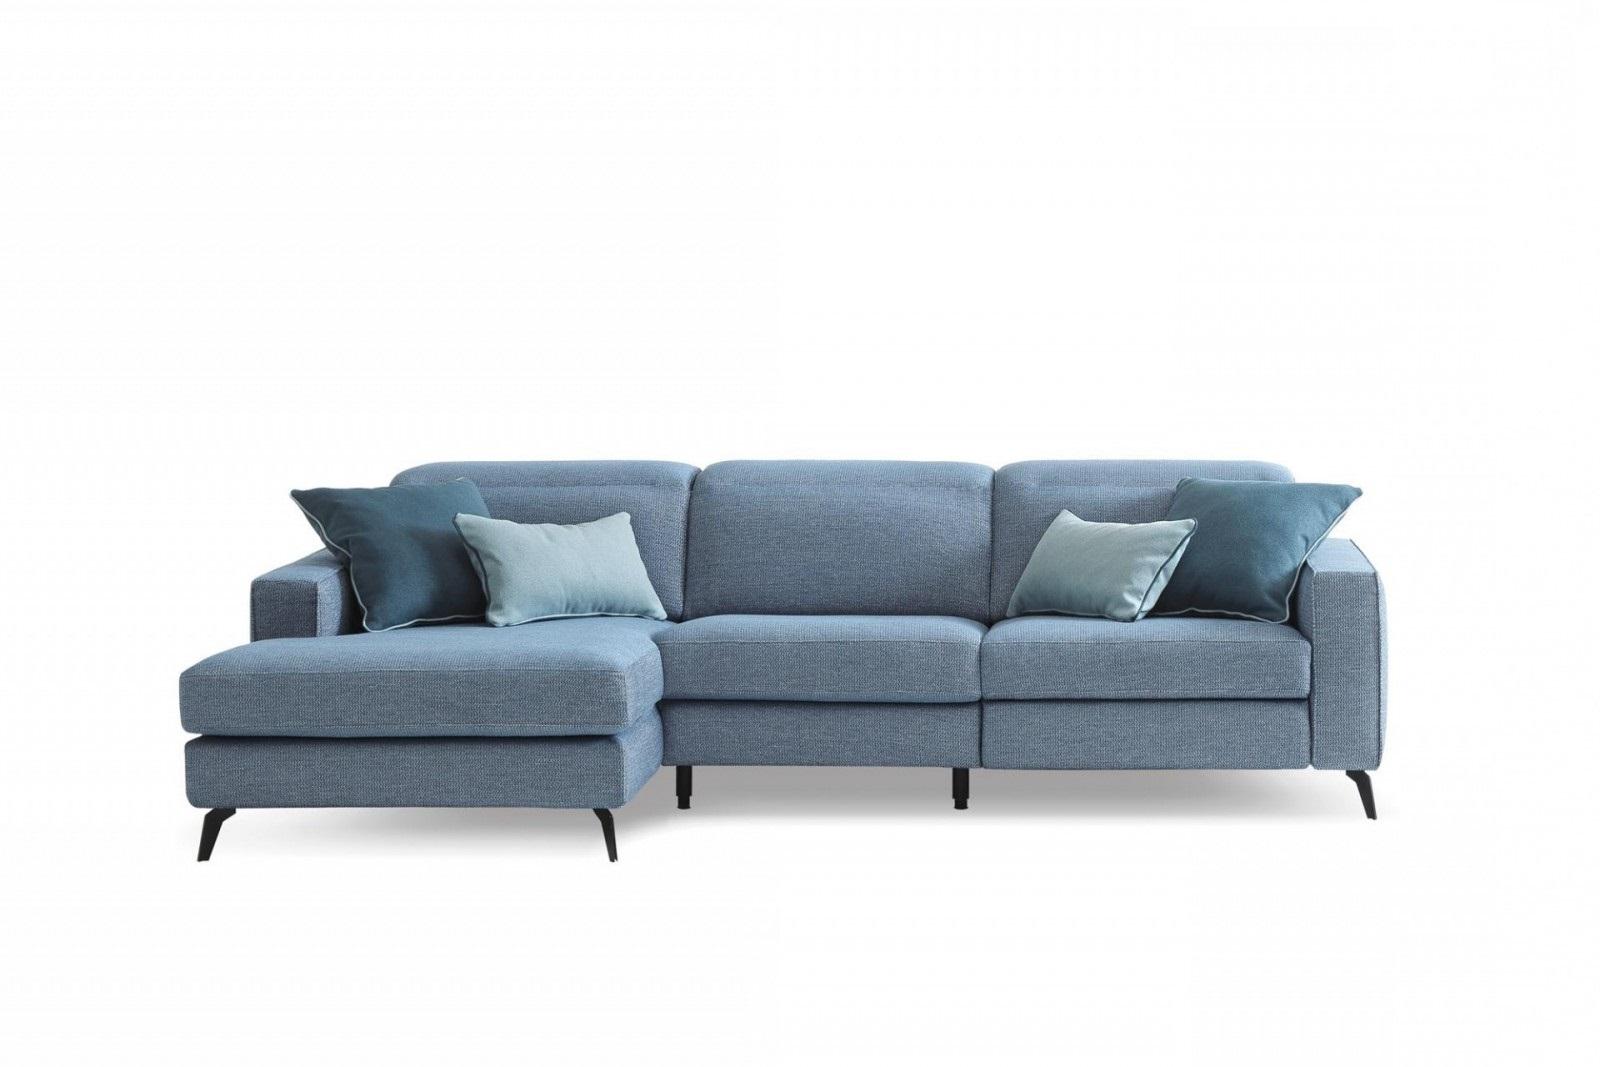 Coltar fix cu mecanism Relax, cu sezlong pe stanga, tapitat cu stofa, Christopher Albastru, l265xA158xH78 cm somproduct.ro